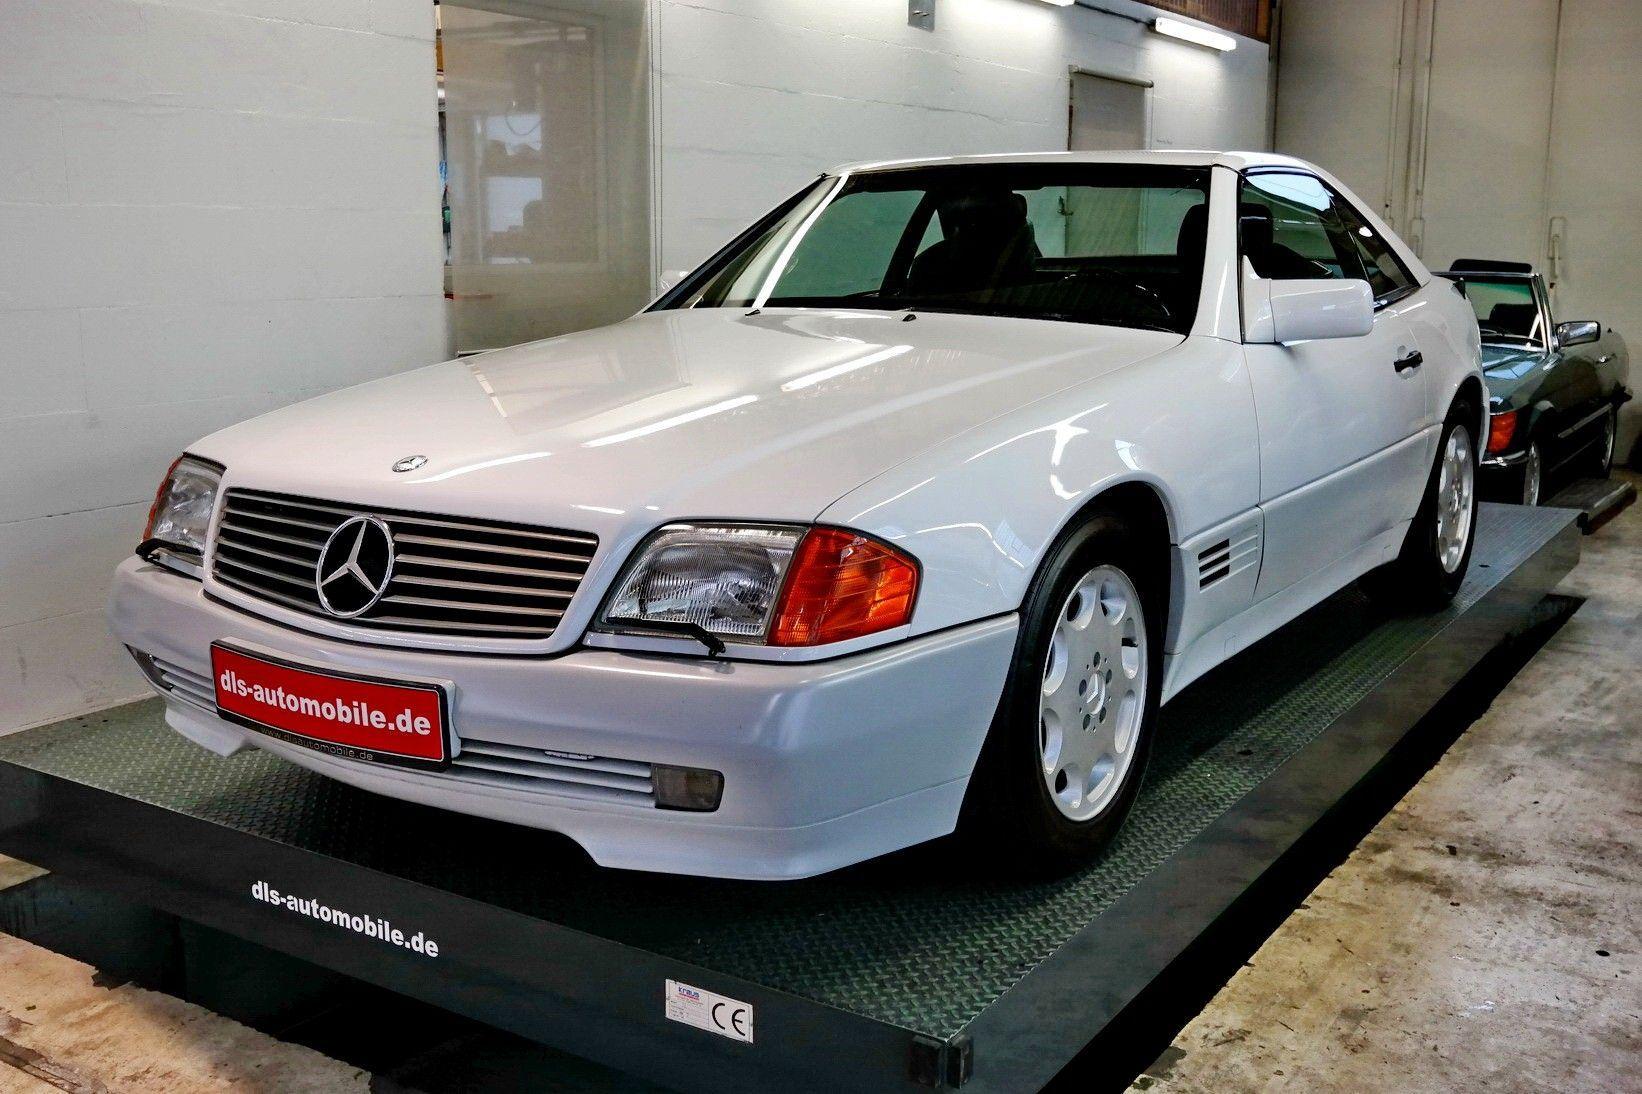 MercedesBenz 500 SL Mercedes benz 500, Mercedes benz